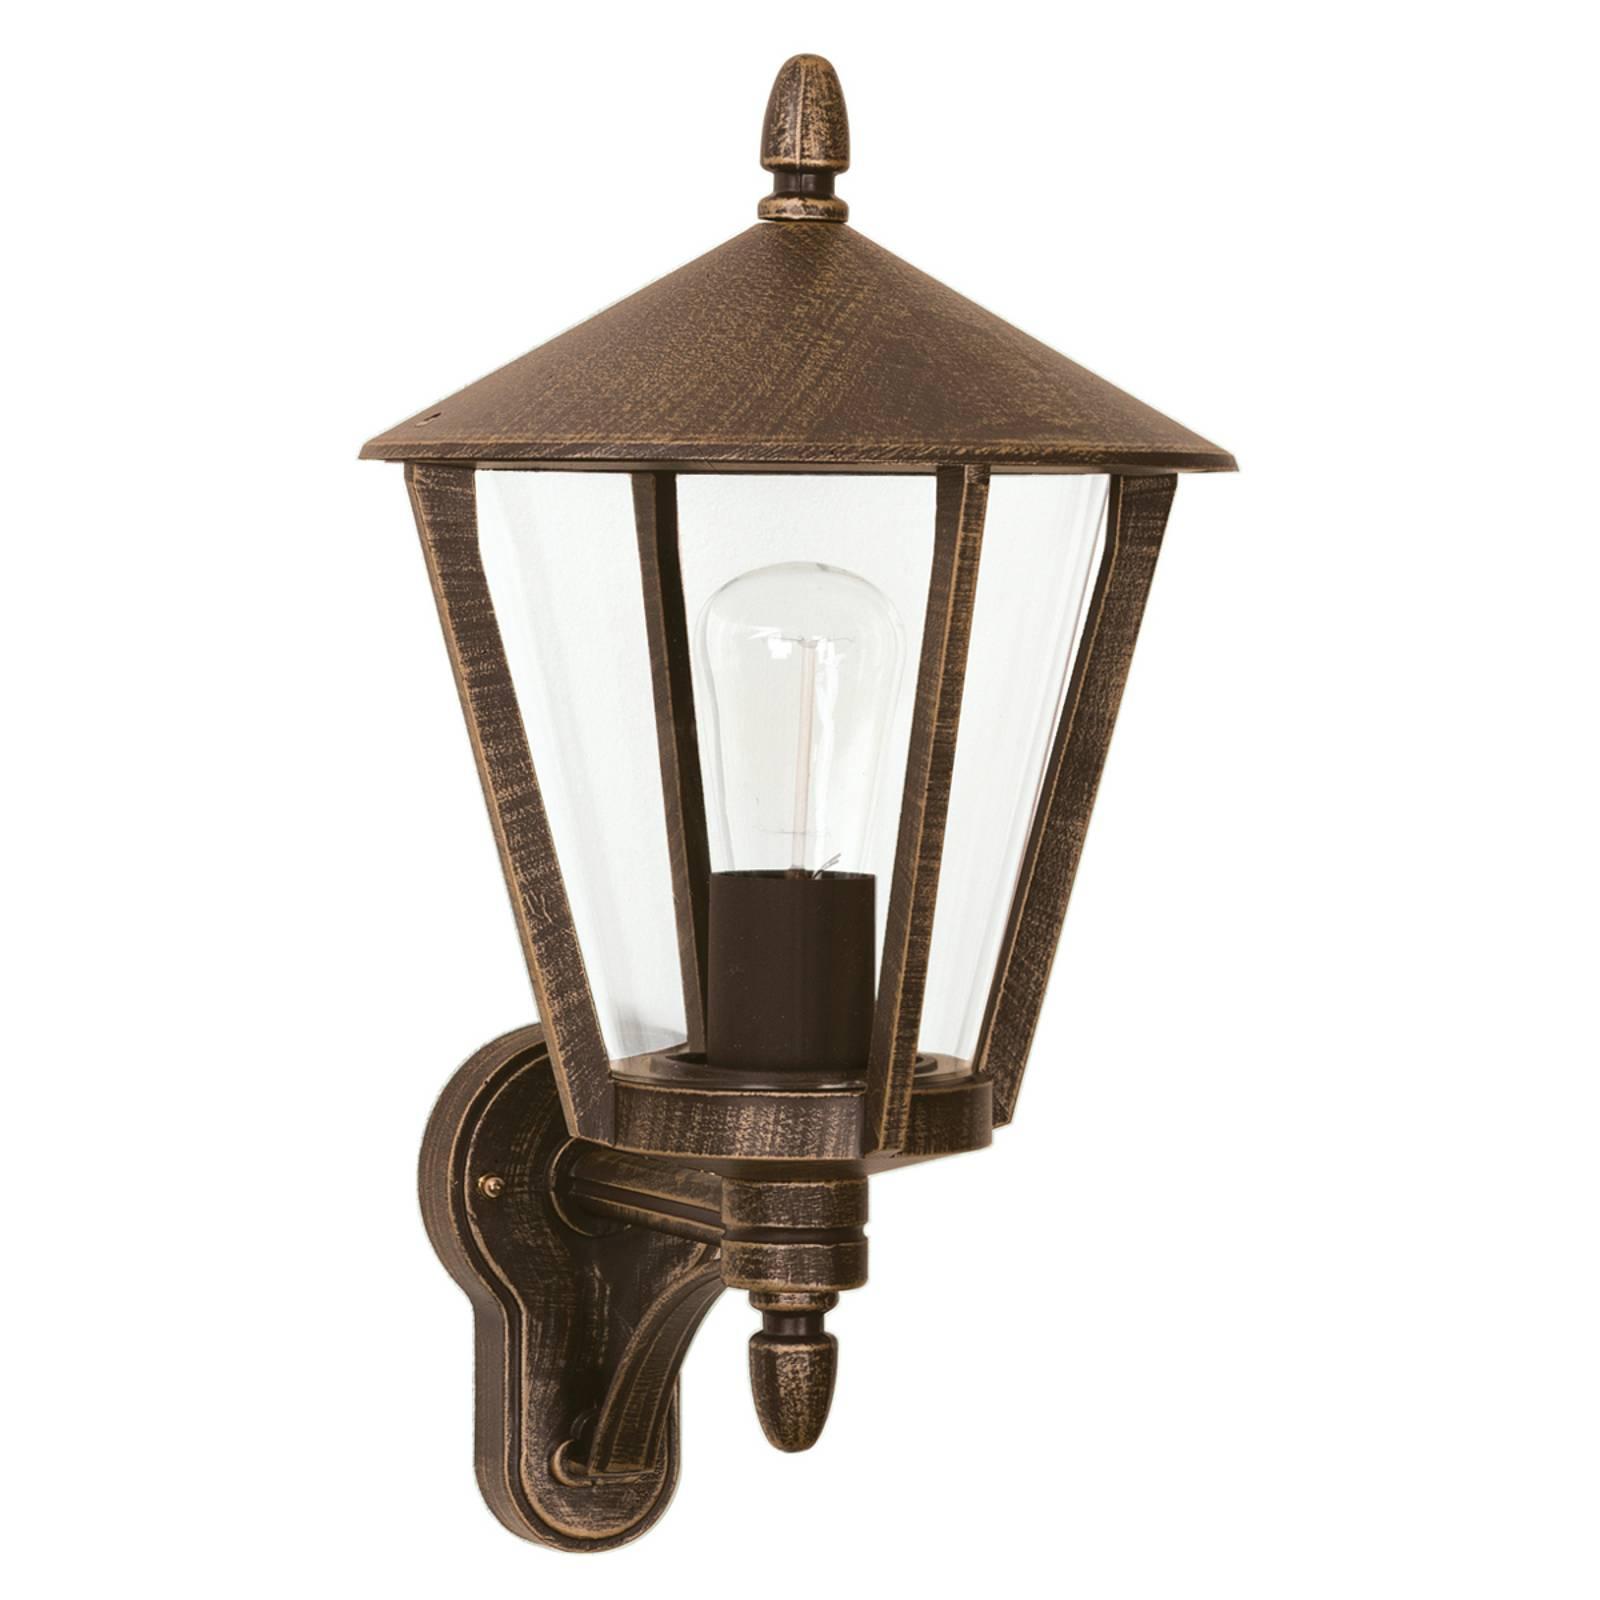 wandbeleuchtung von albert leuchten bei i love. Black Bedroom Furniture Sets. Home Design Ideas